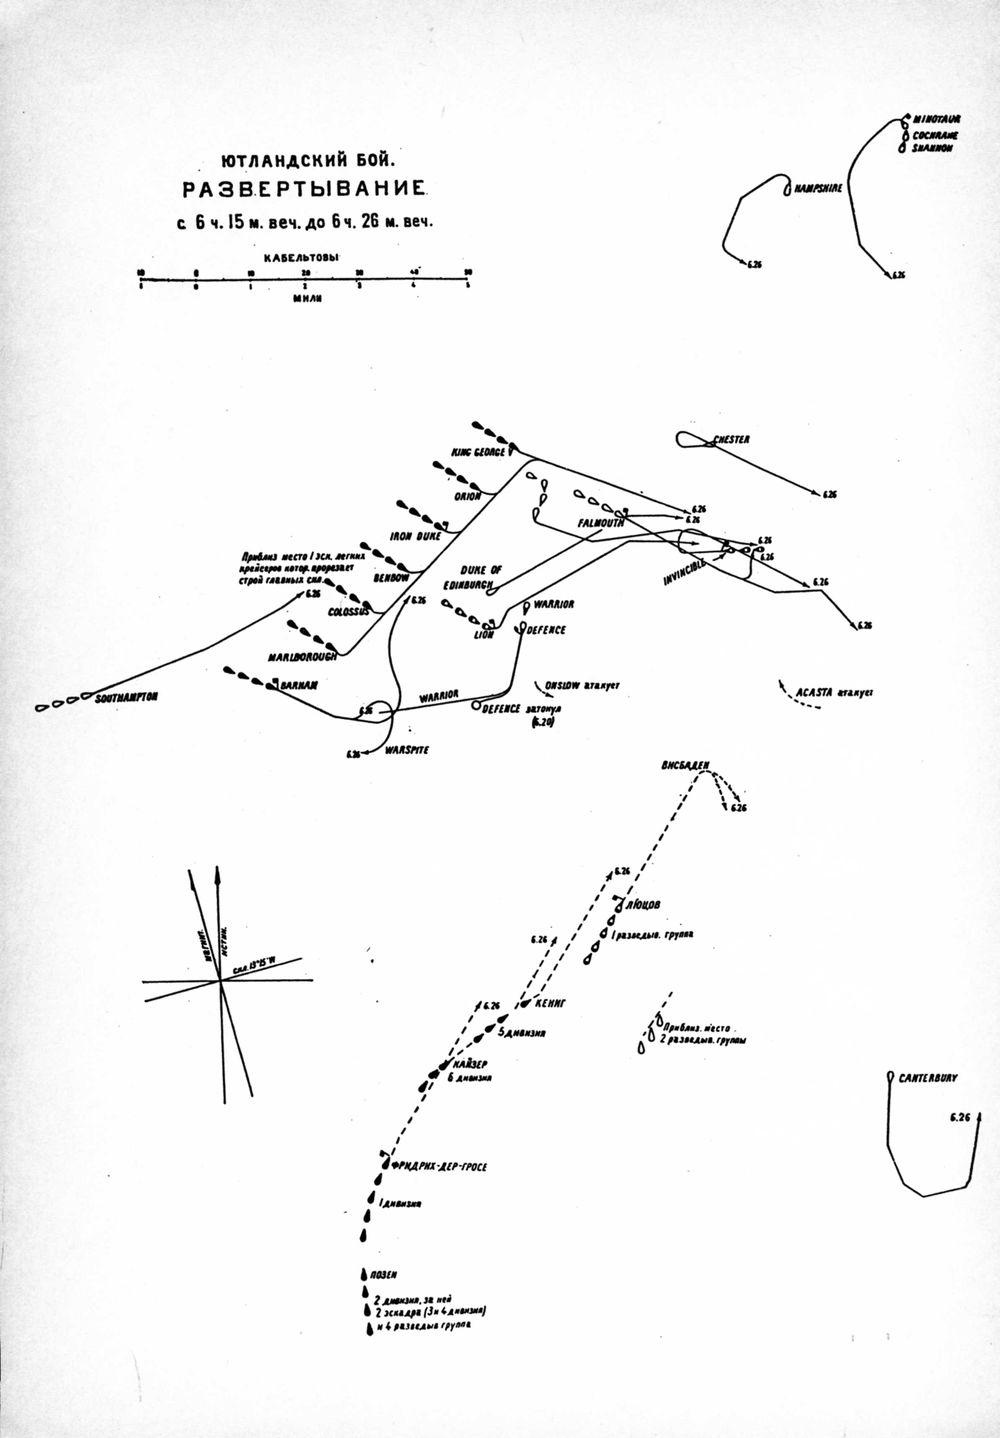 Map_14_(развёртование_615-626).jpg